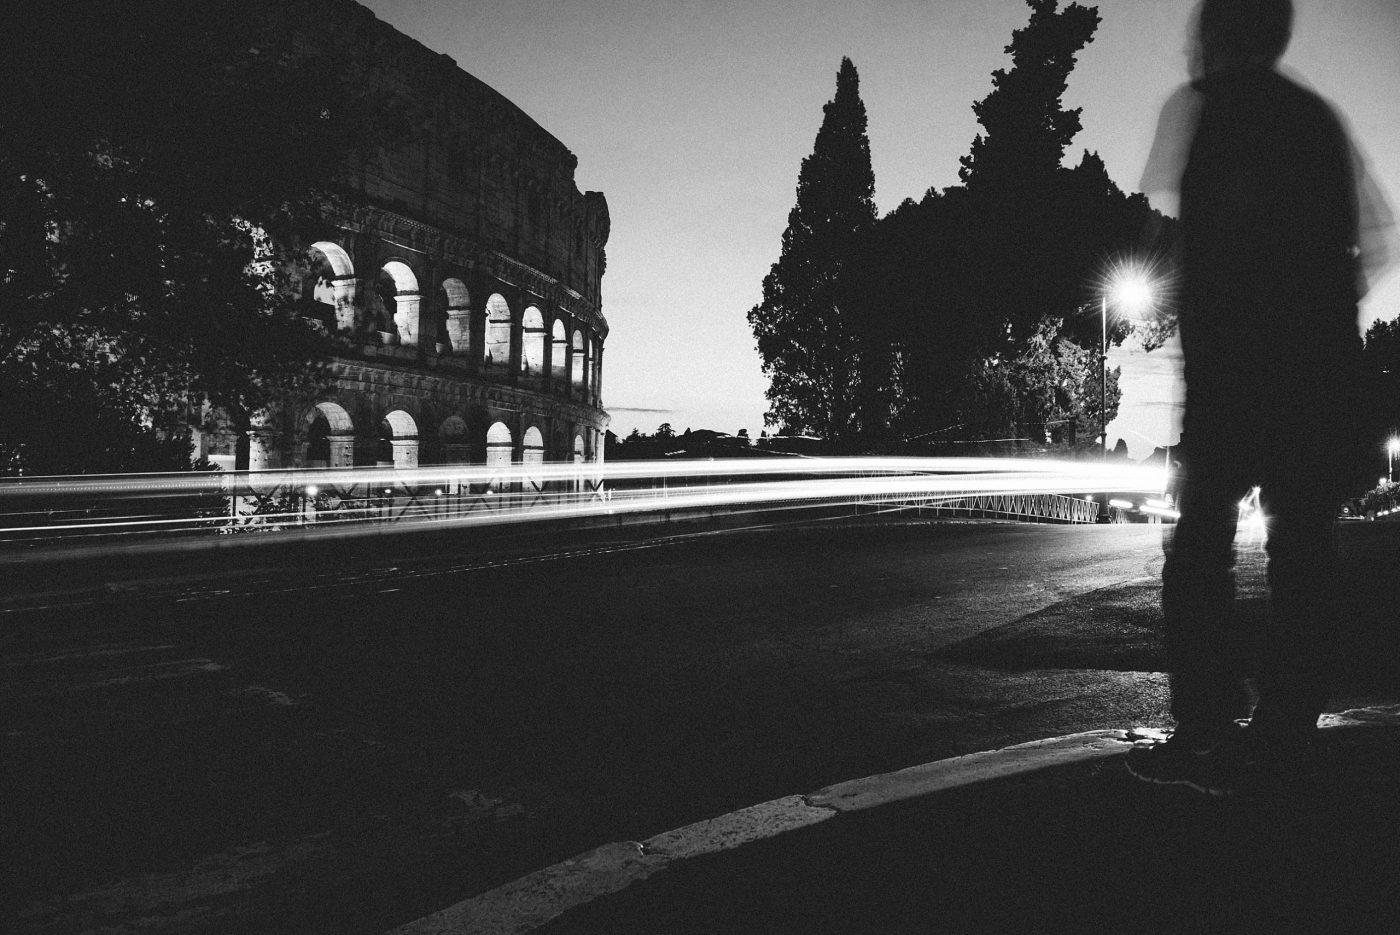 The Colosseum Rome long exposure photo